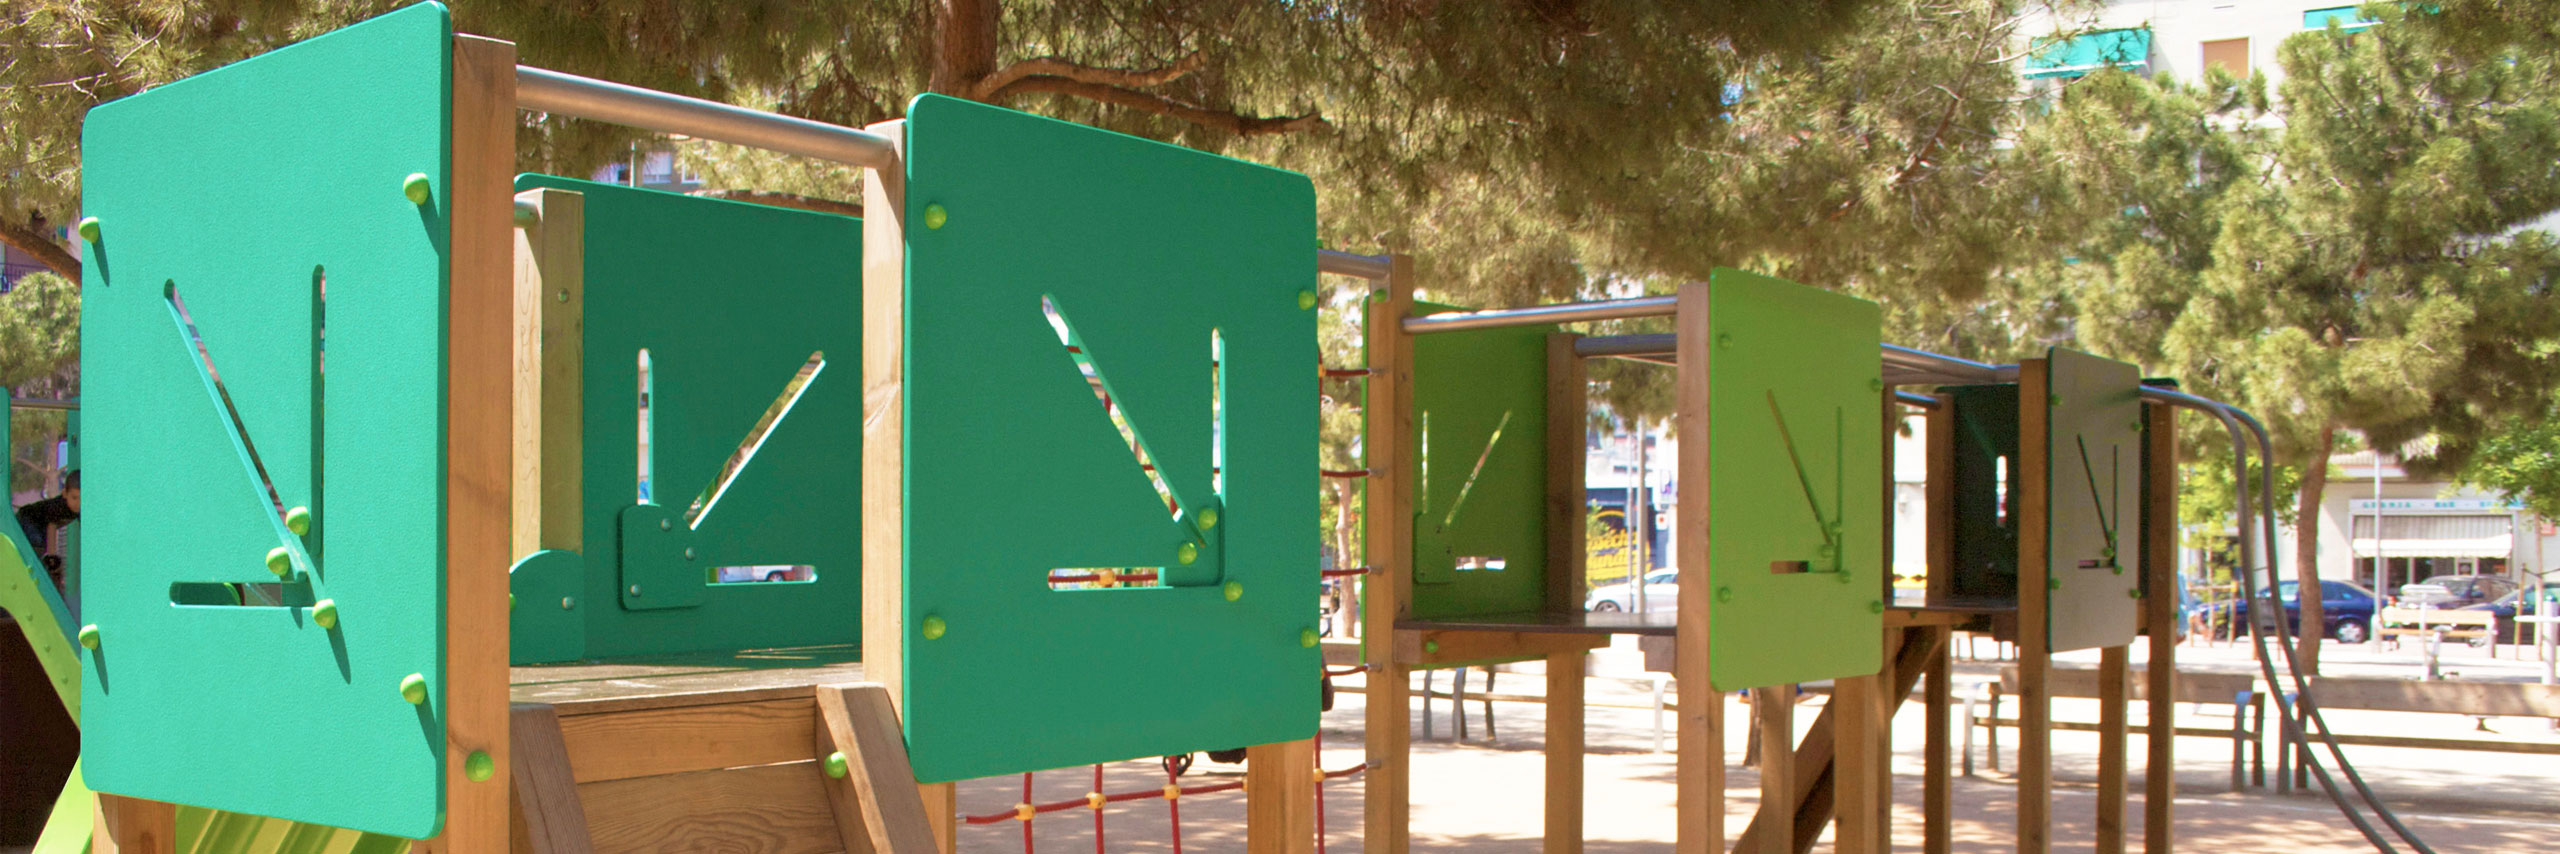 colomer-nou-parc-fundicion-mobiliario-urbano-parques-infantiles-restauracion-cabecera-parques-infantiles